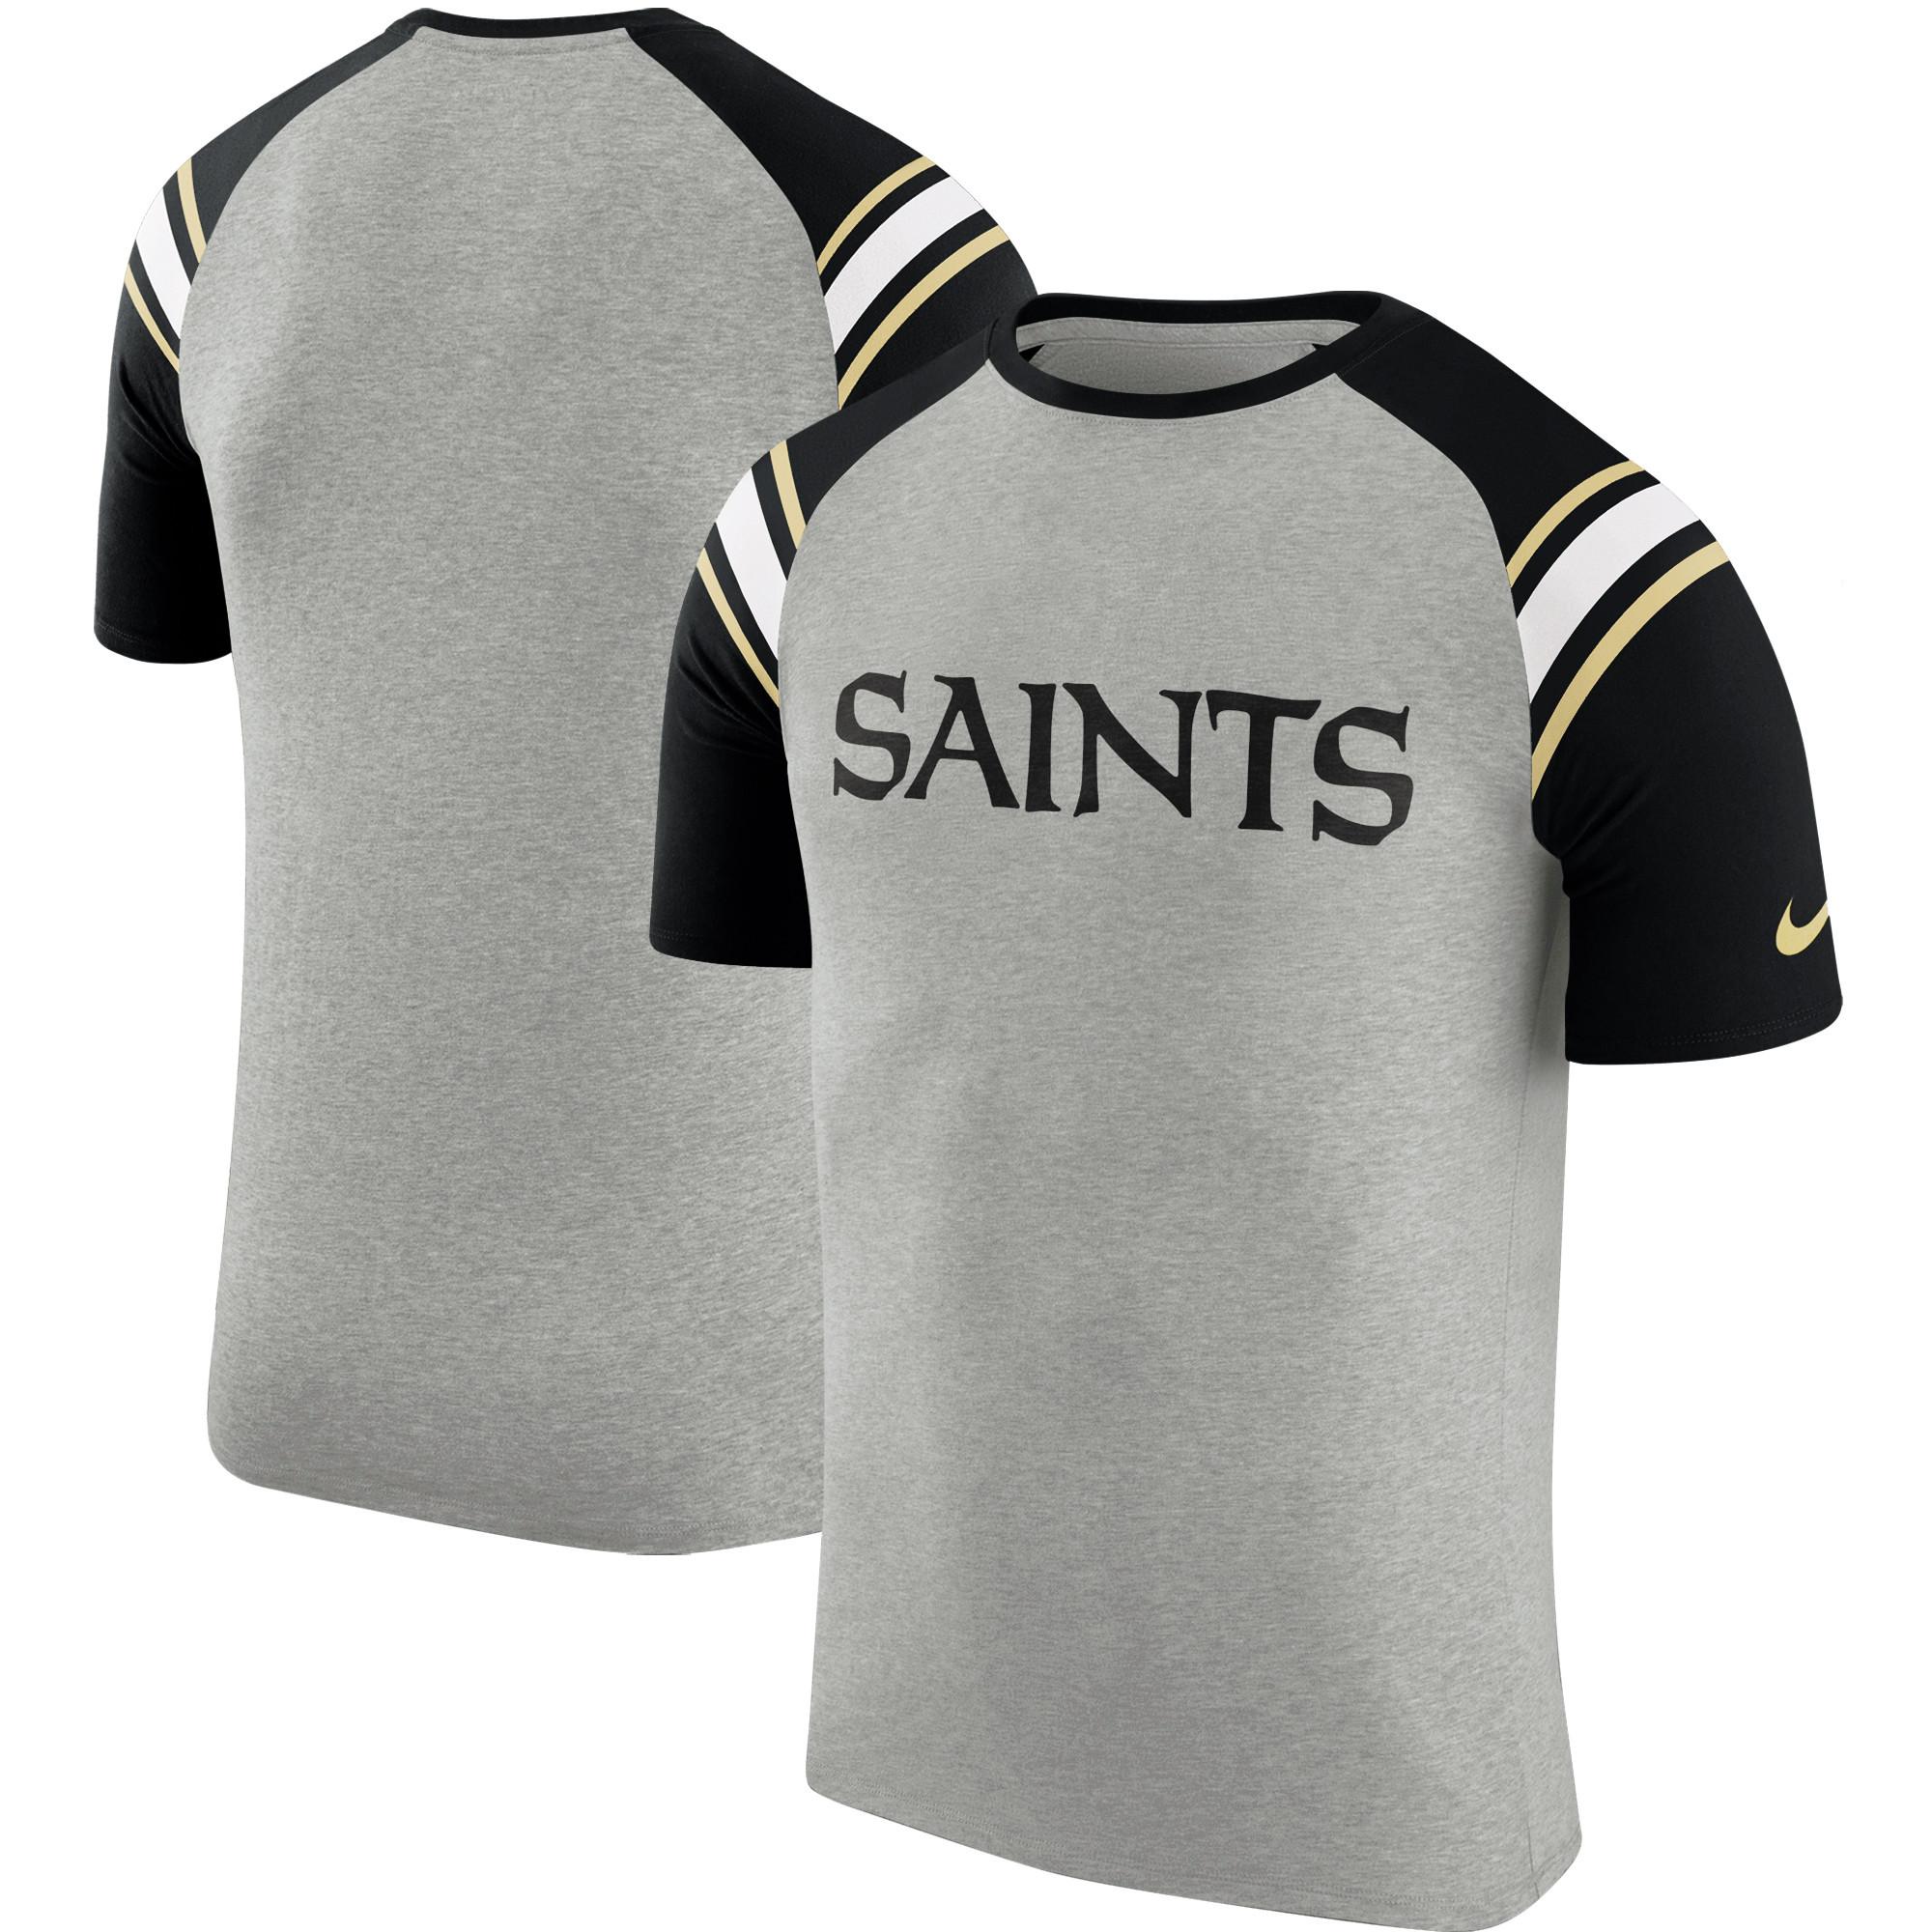 Men's Nike Heathered Gray New Orleans Saints Enzyme Shoulder Stripe Raglan T-Shirt